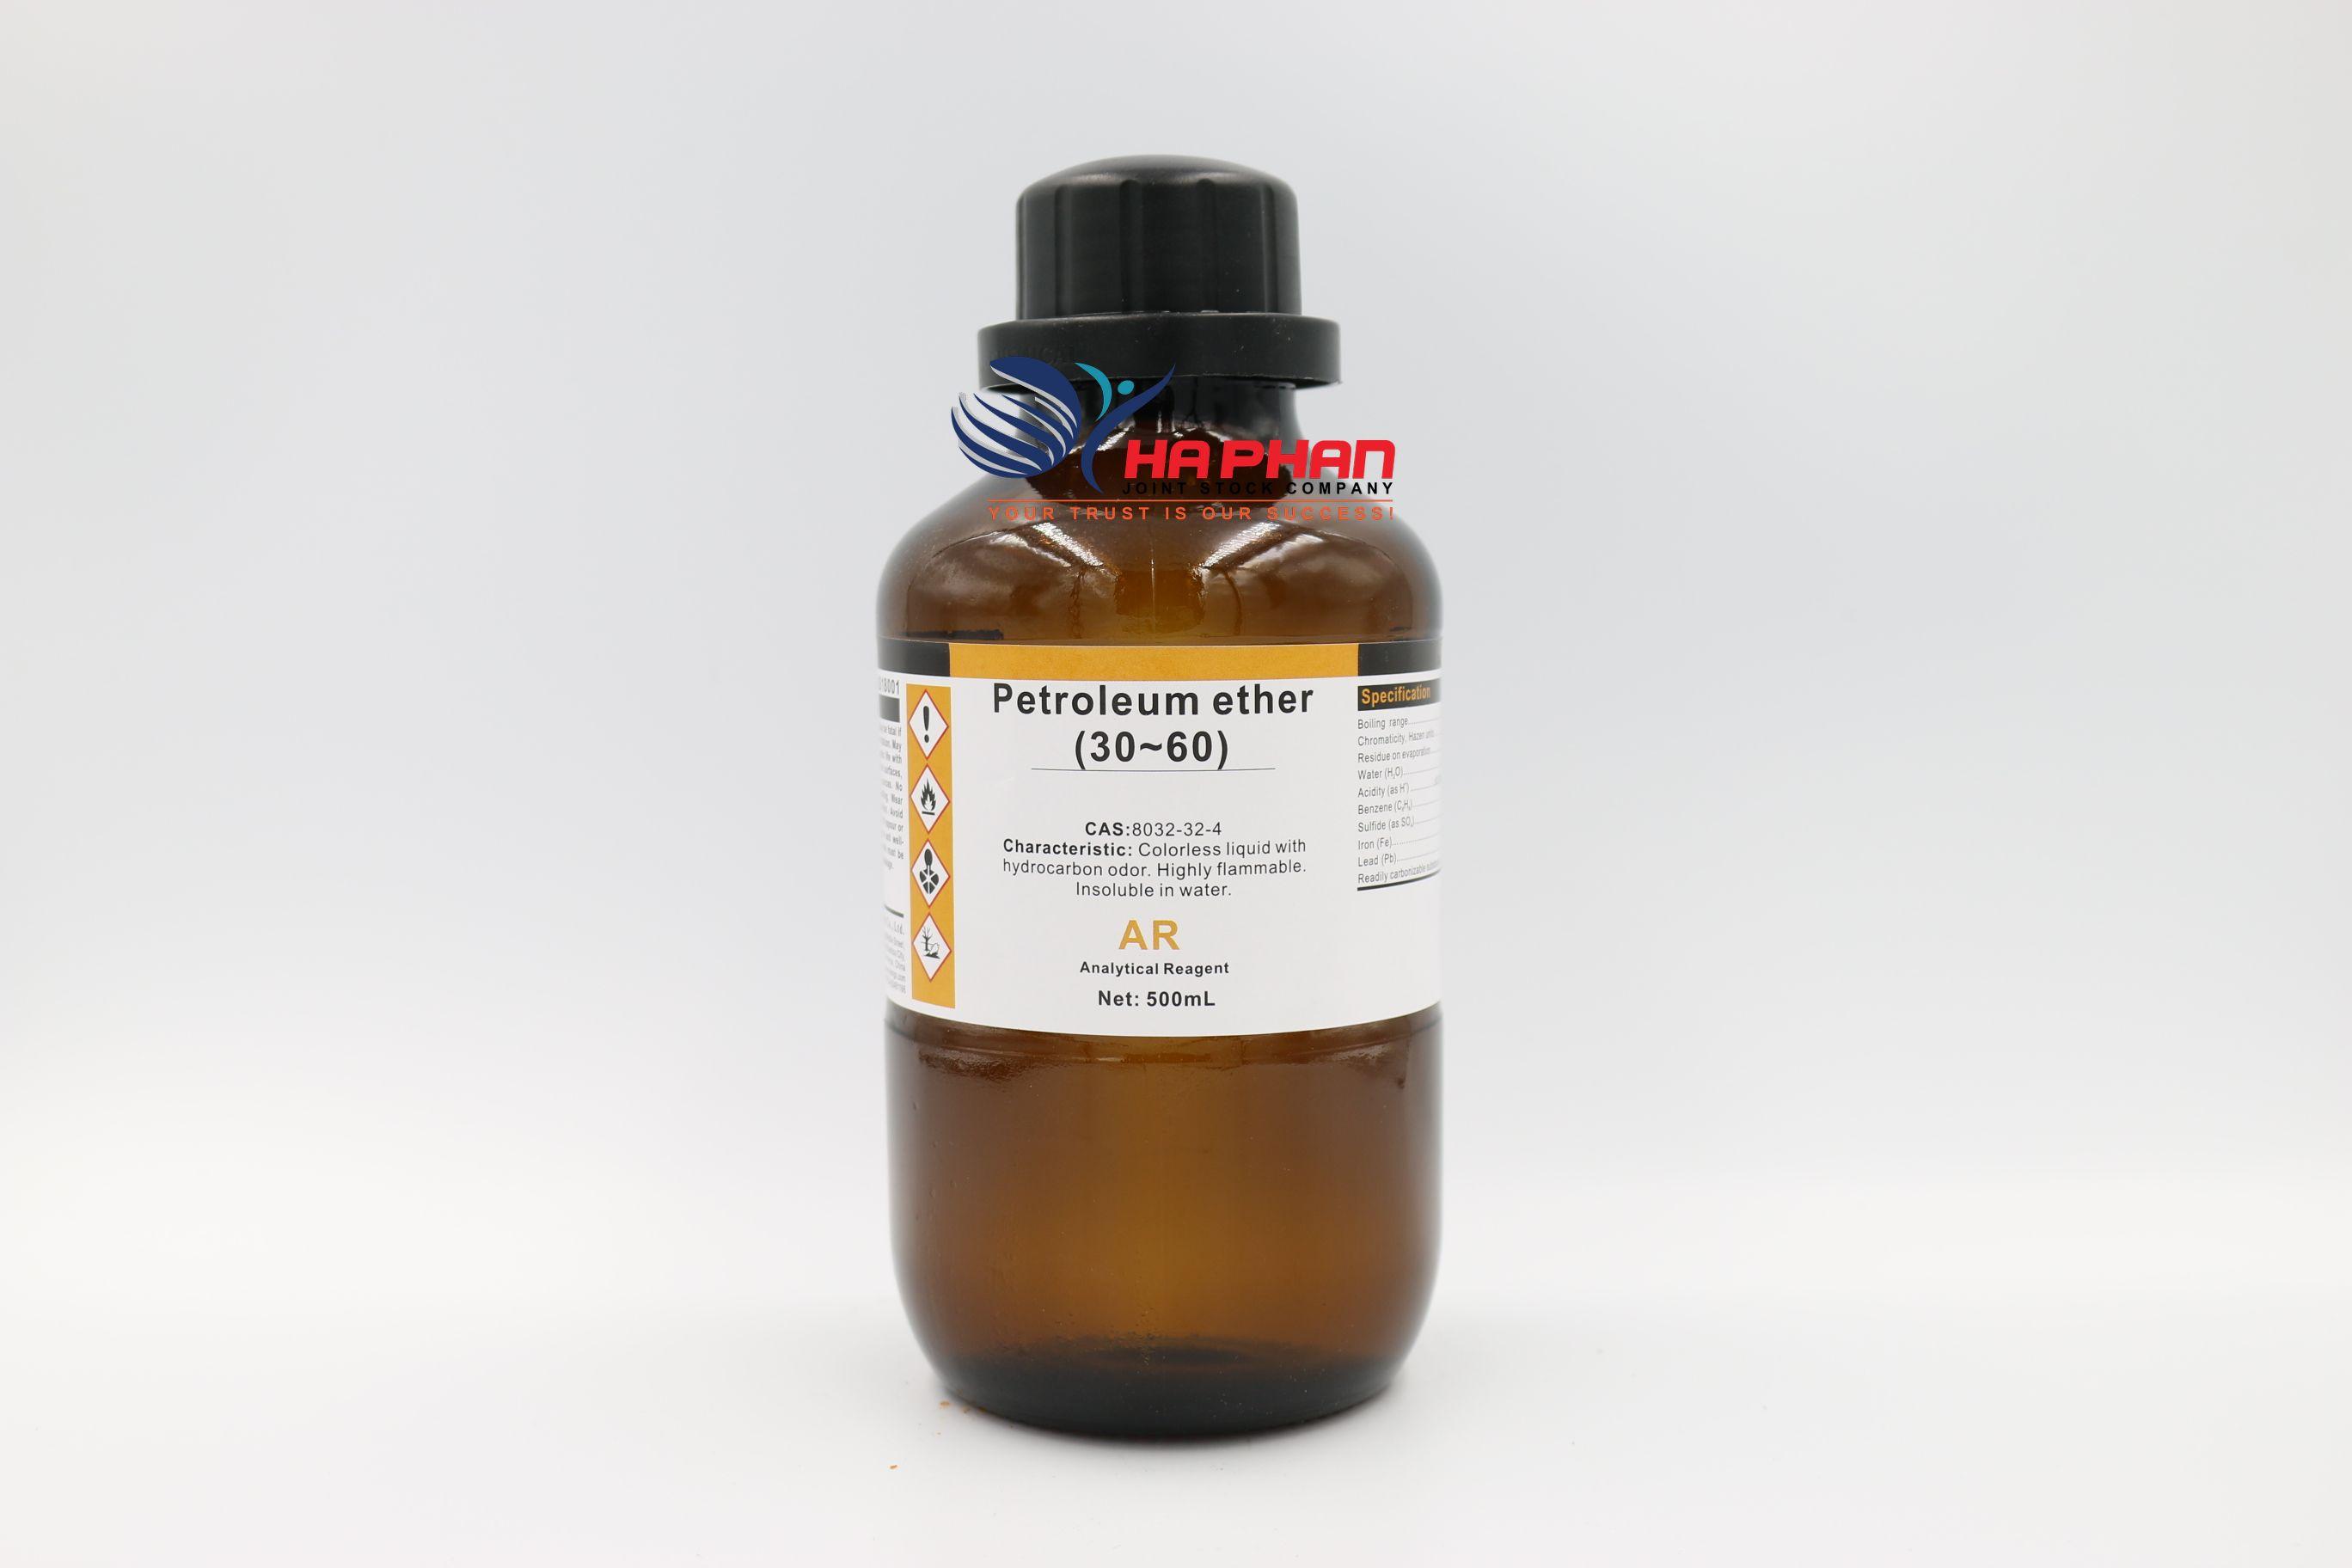 Petroleum ether 30-60